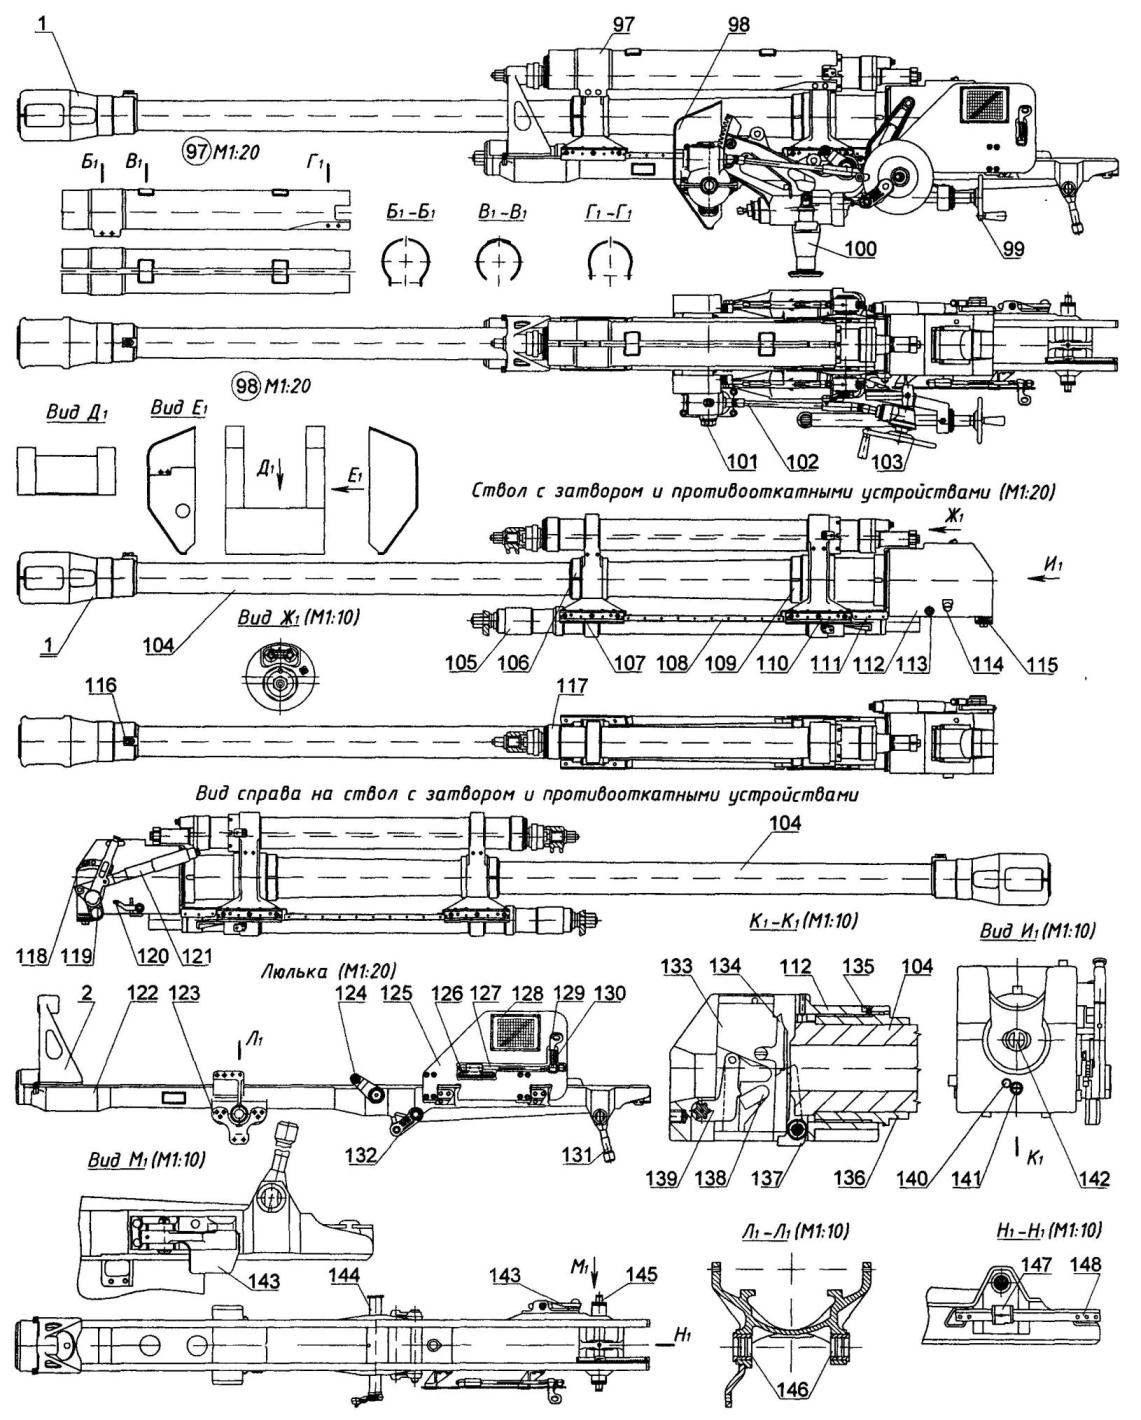 76-мм дивизионная пушка образца 1942 года ЗИС-3